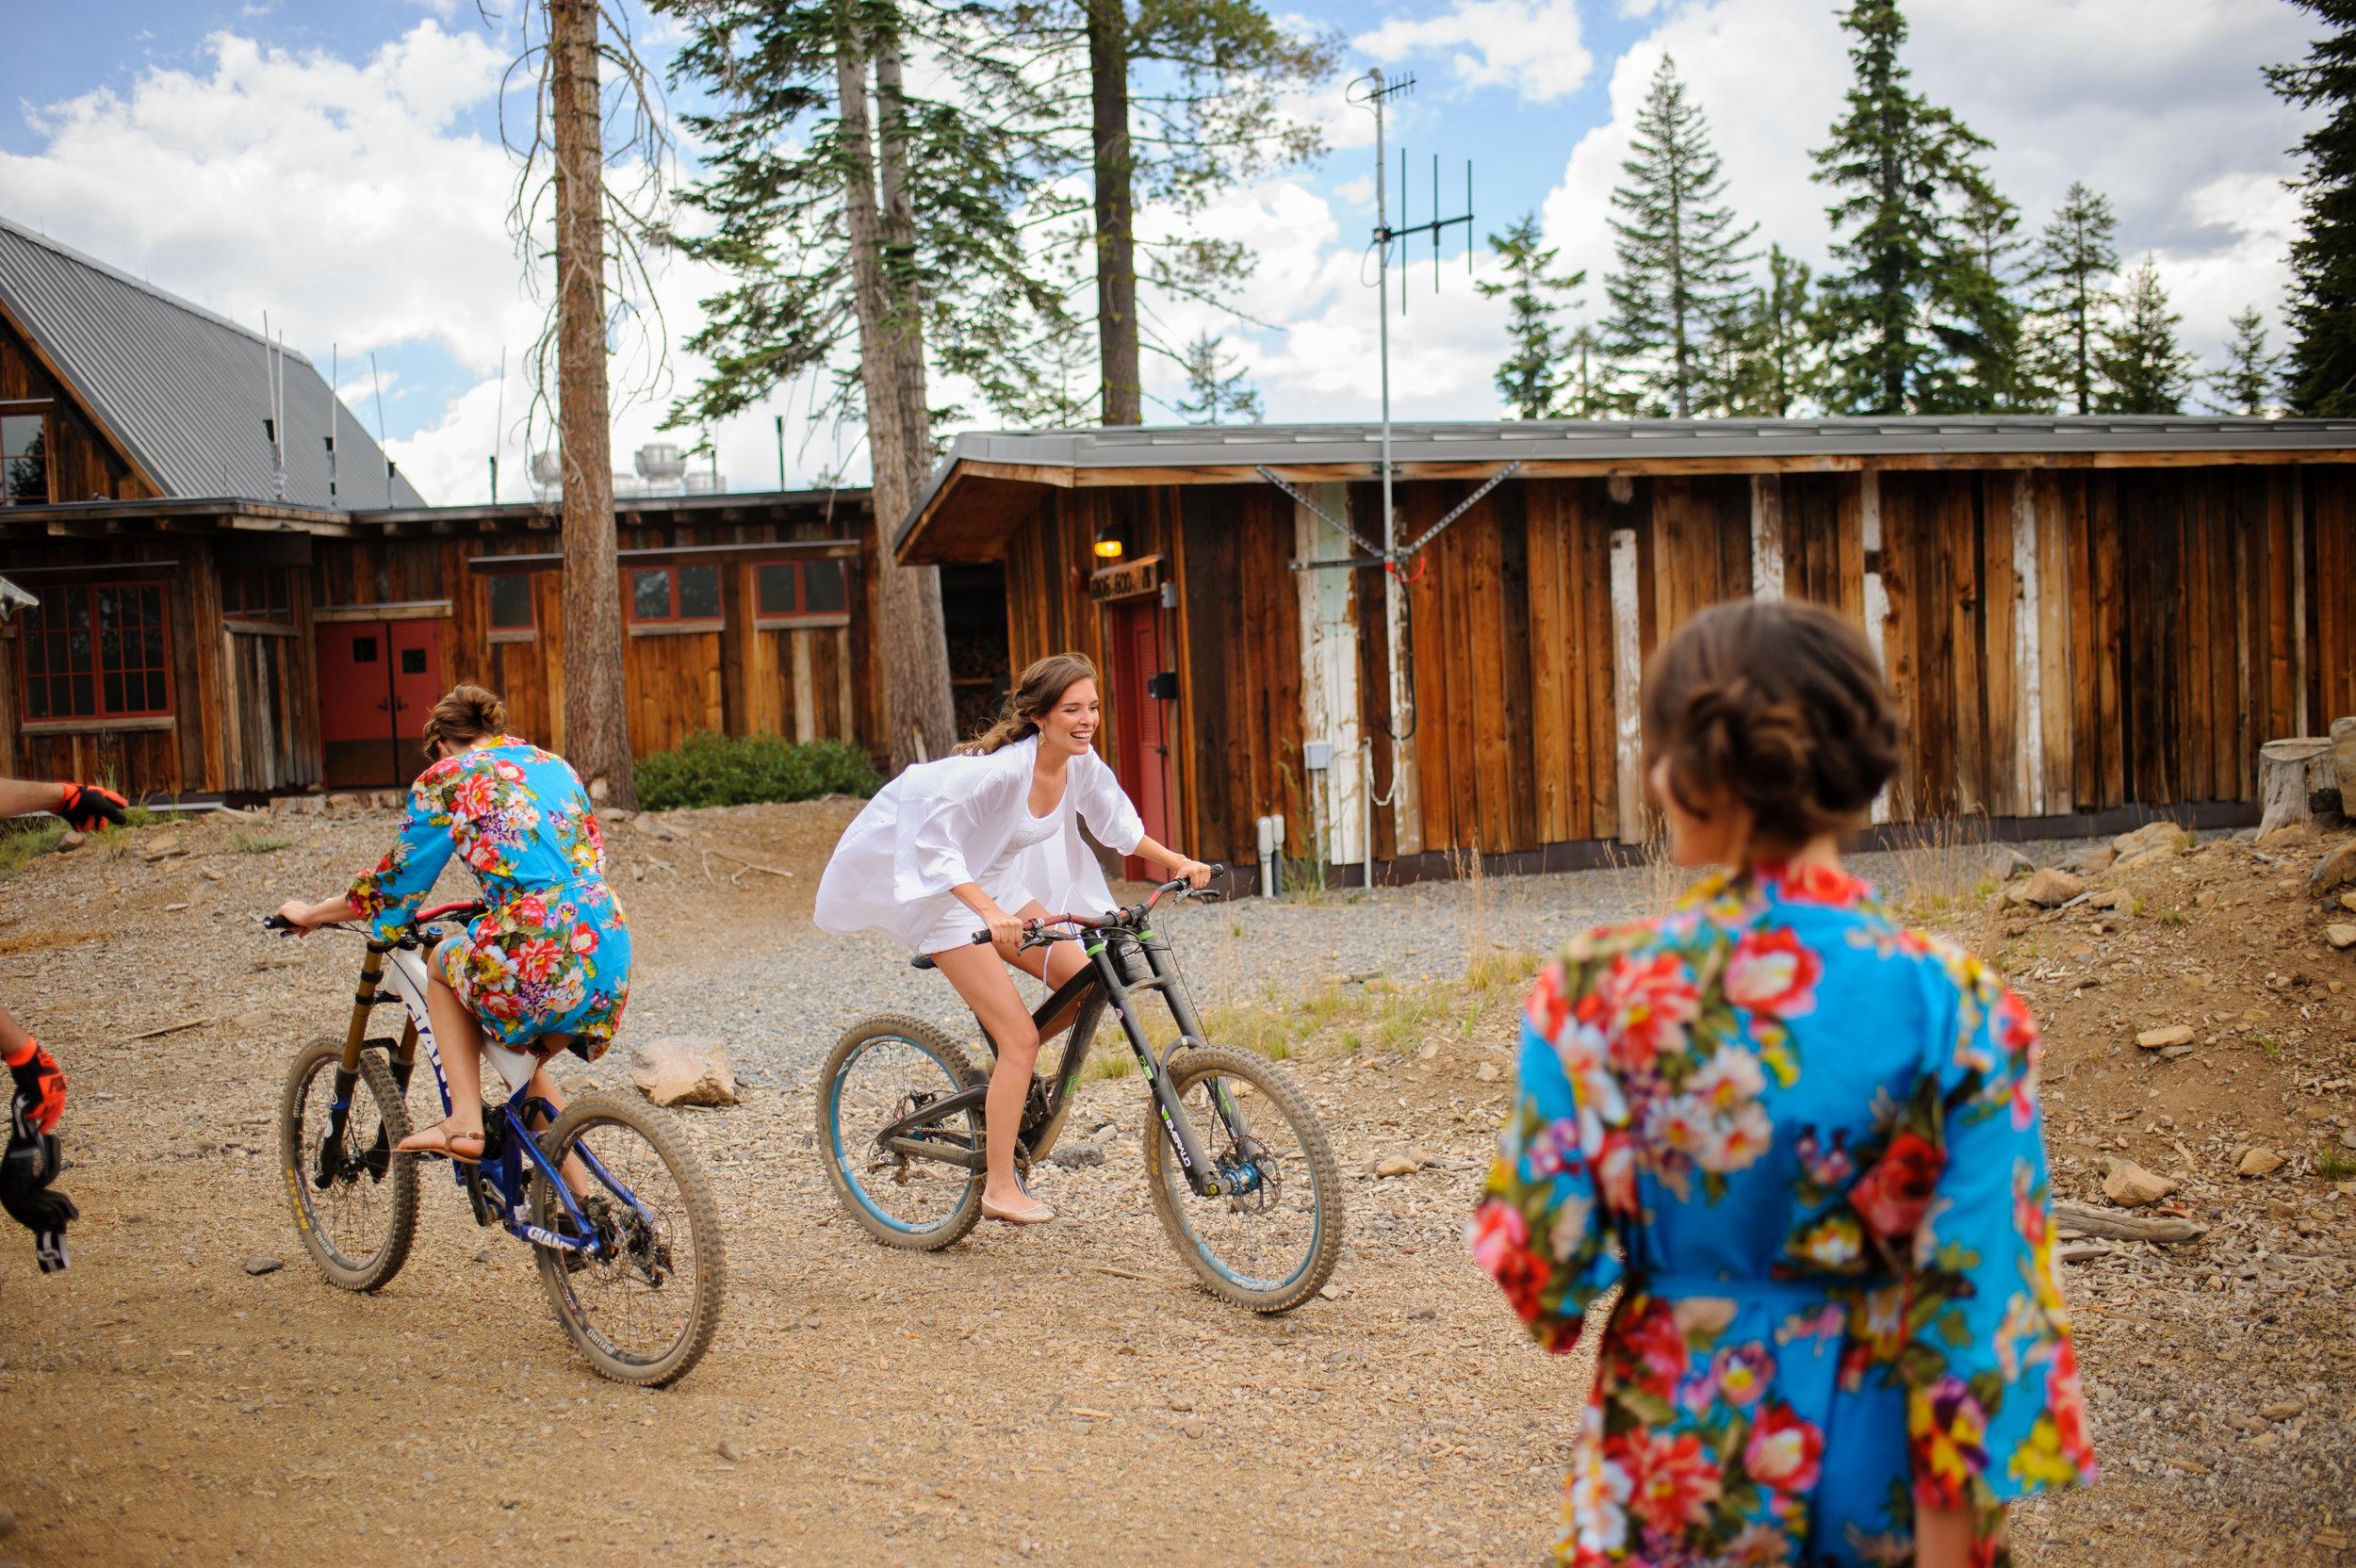 katie-myles-003-northstar-resort-tahoe-wedding-photographer-katherine-nicole-photography.JPG